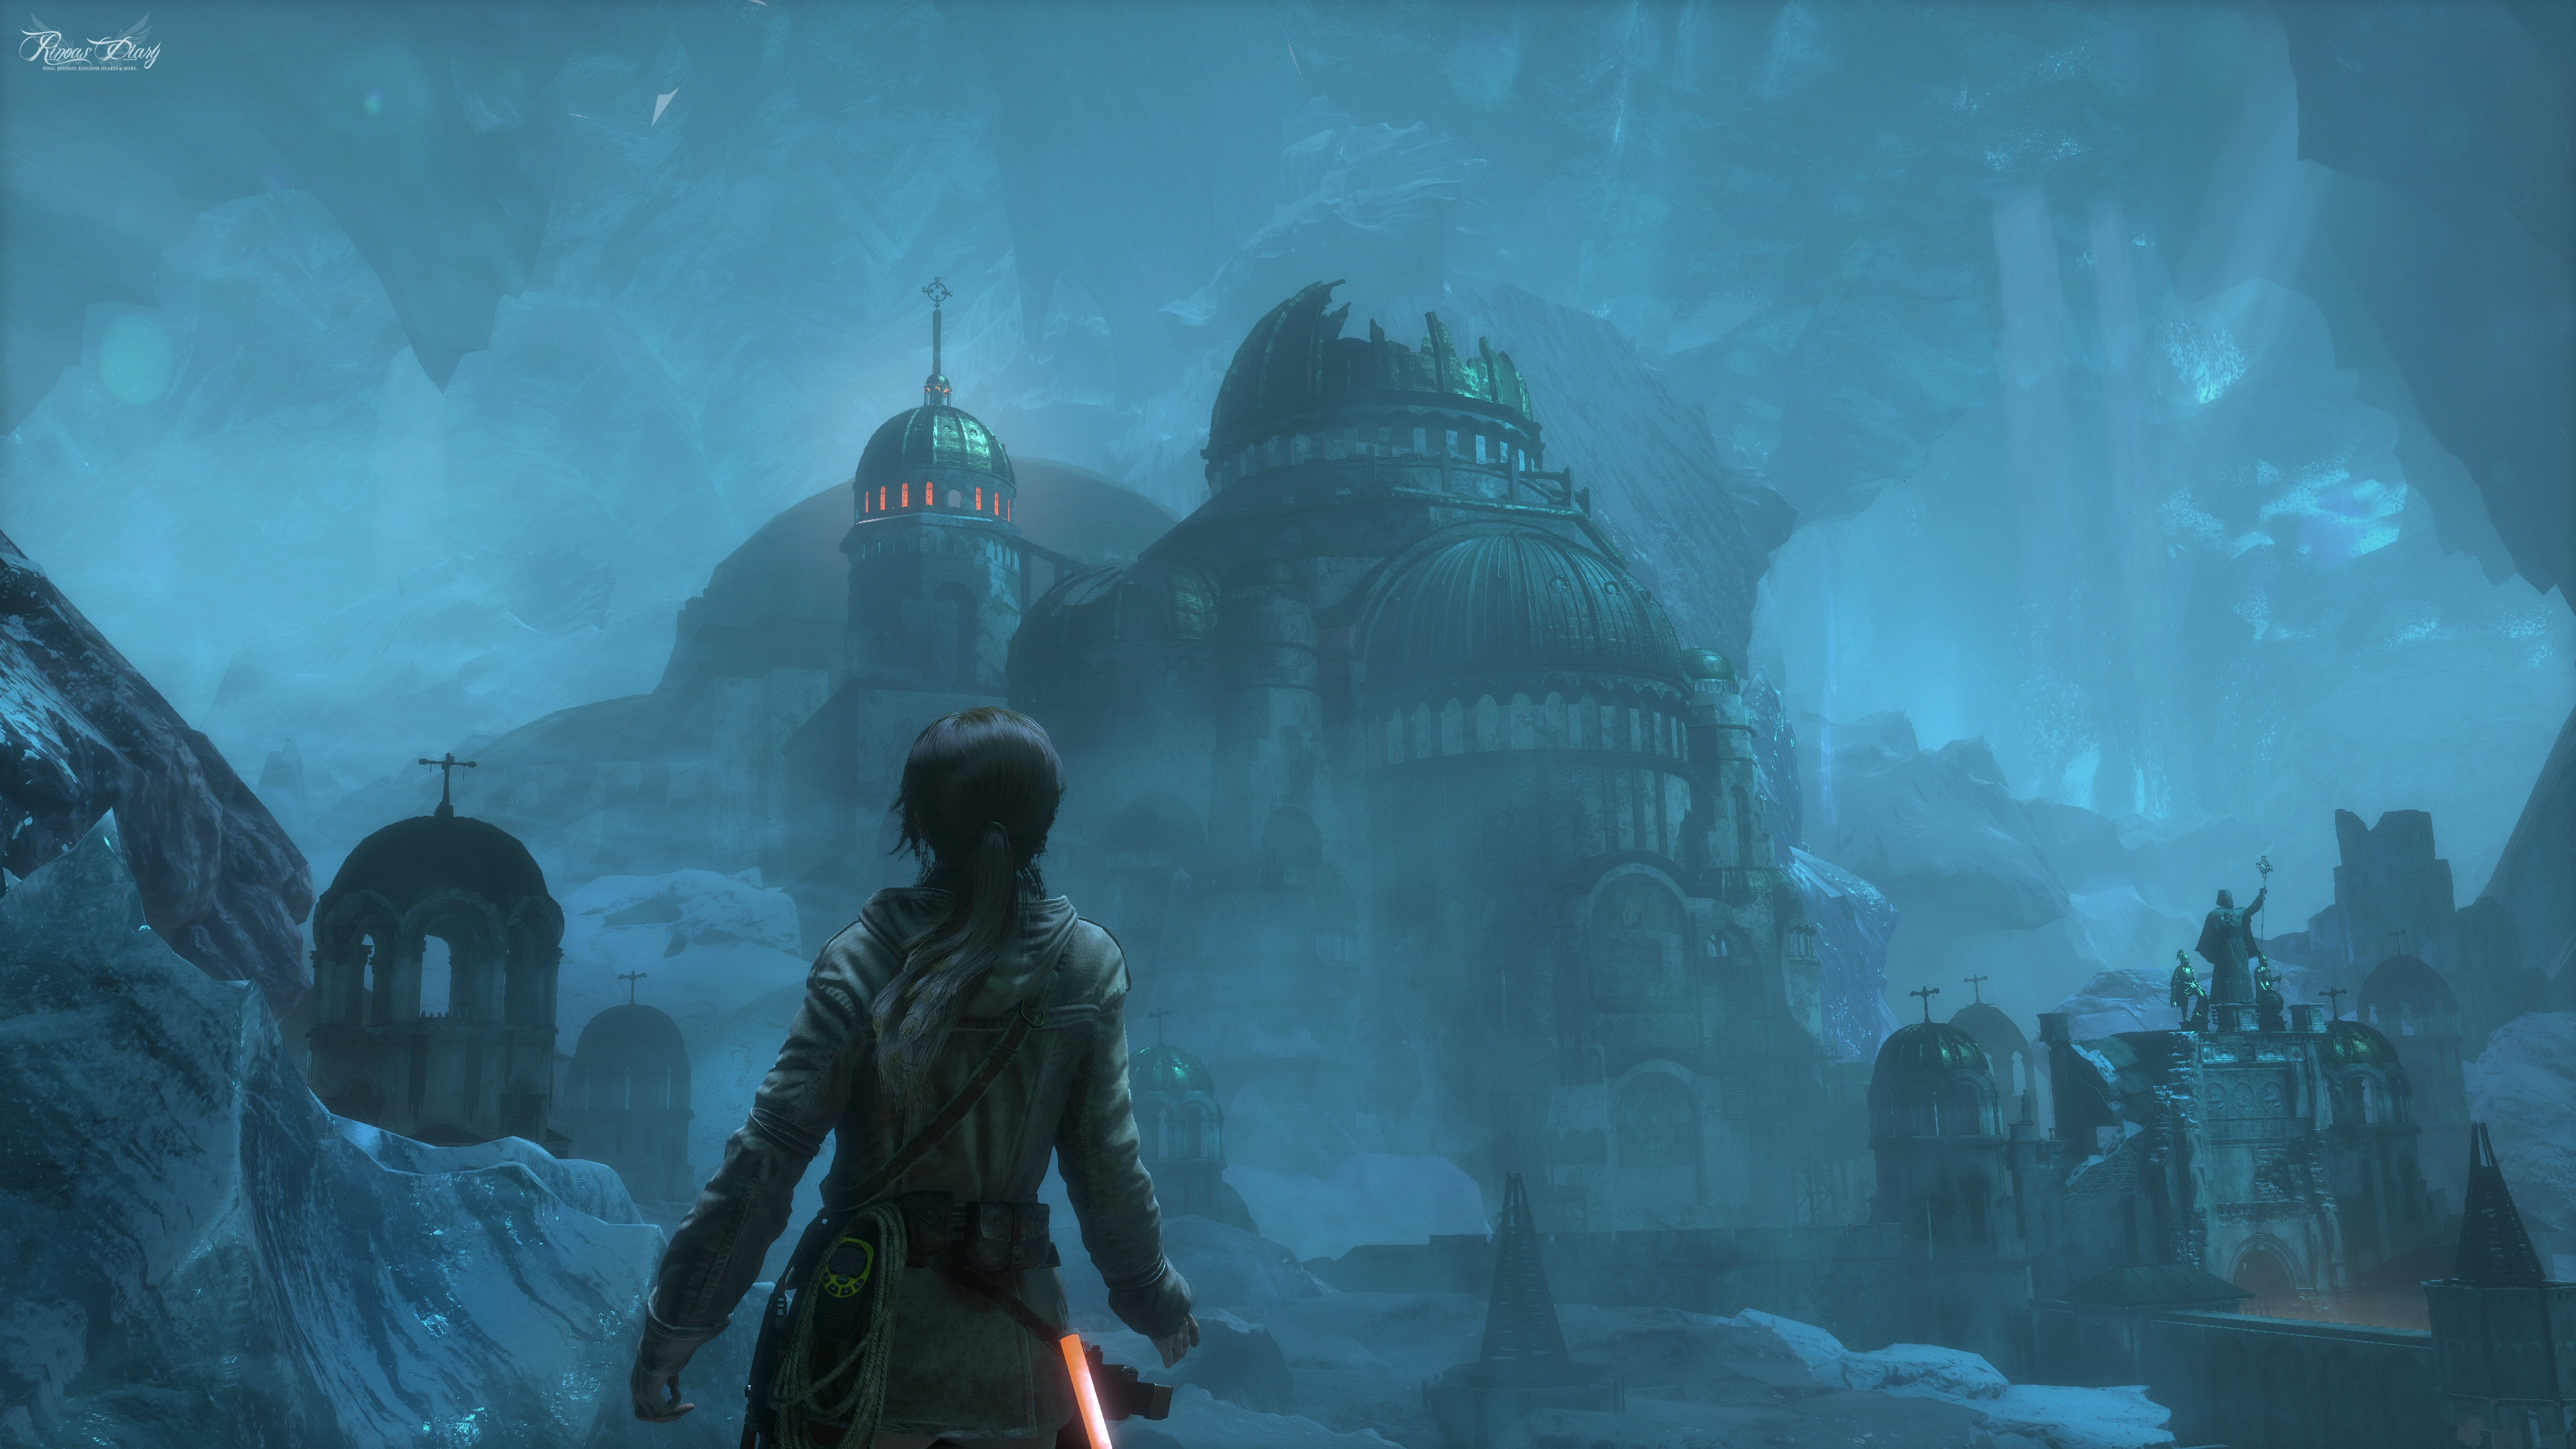 Rise of the Tomb Raider arriva su Xbox One X